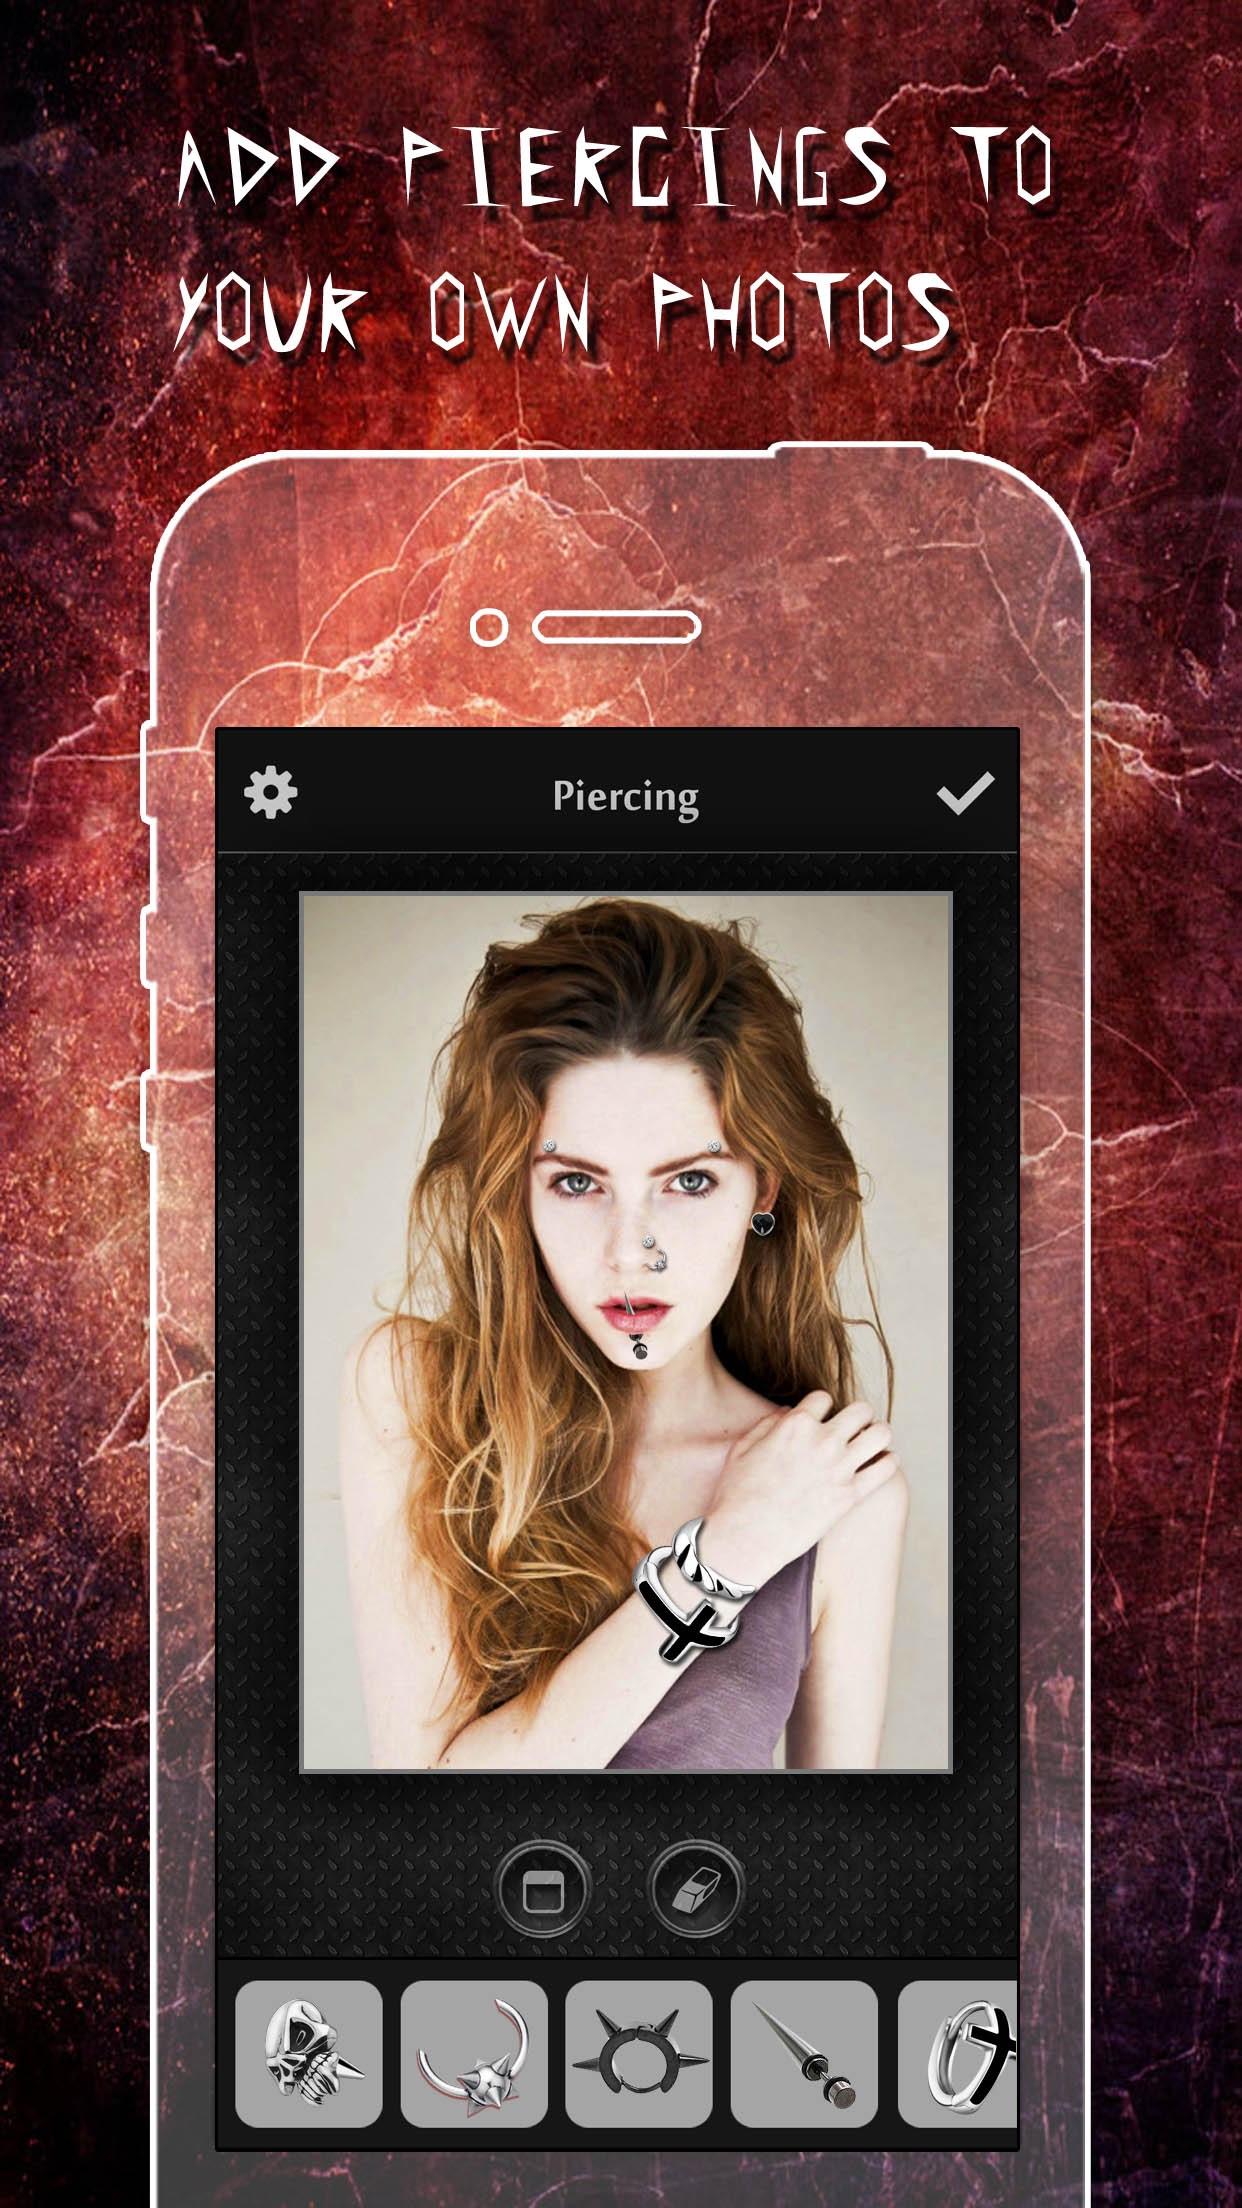 Piercing & Tattoo Booth FREE - Add Virtual Piercings & Tattoos to make body art inked or pierced Screenshot